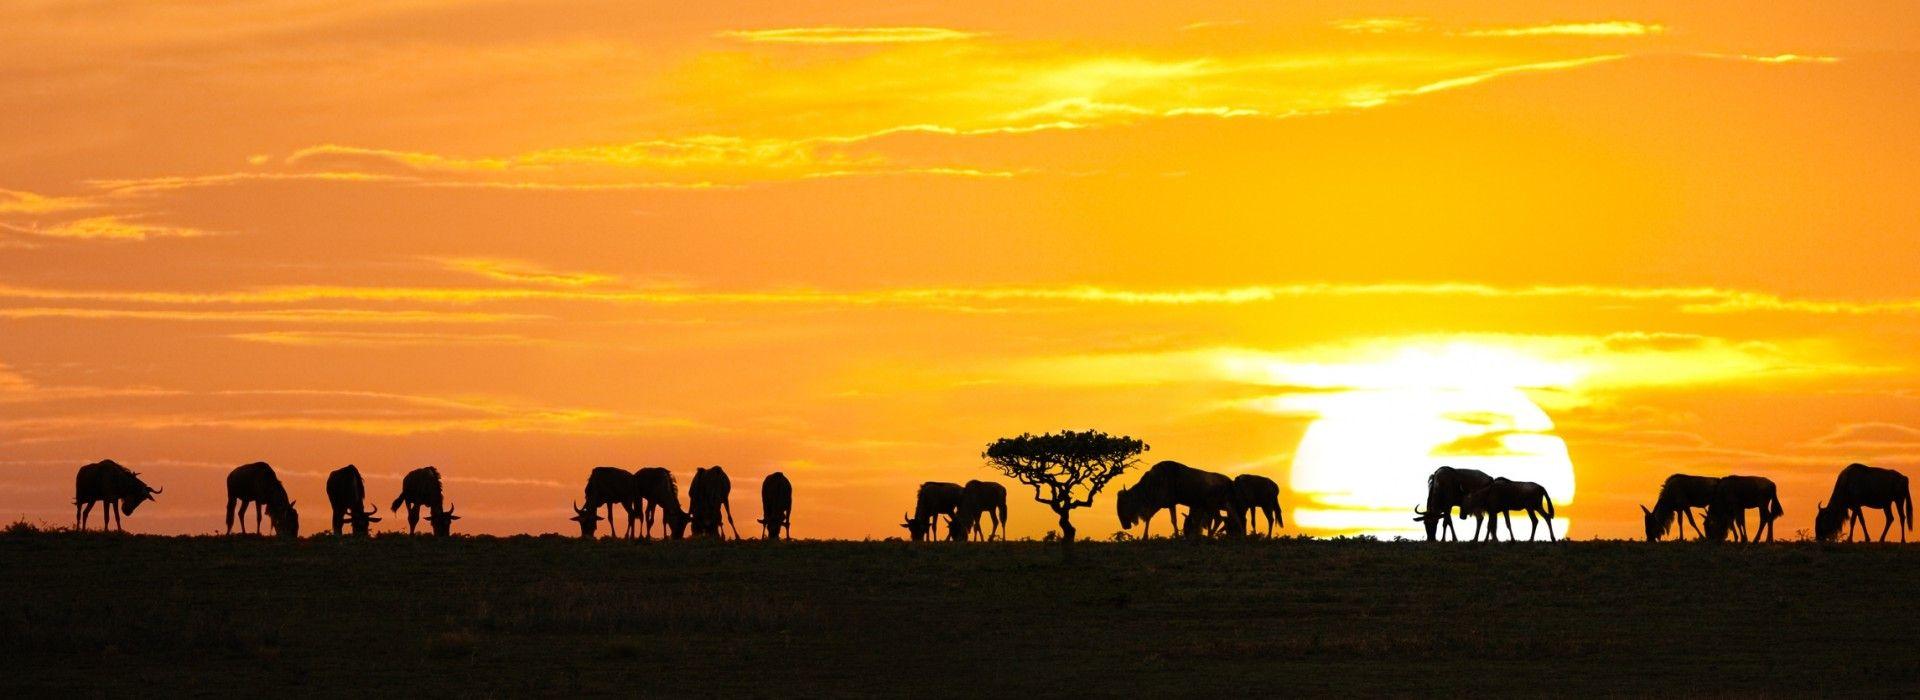 Walking tours in Arusha